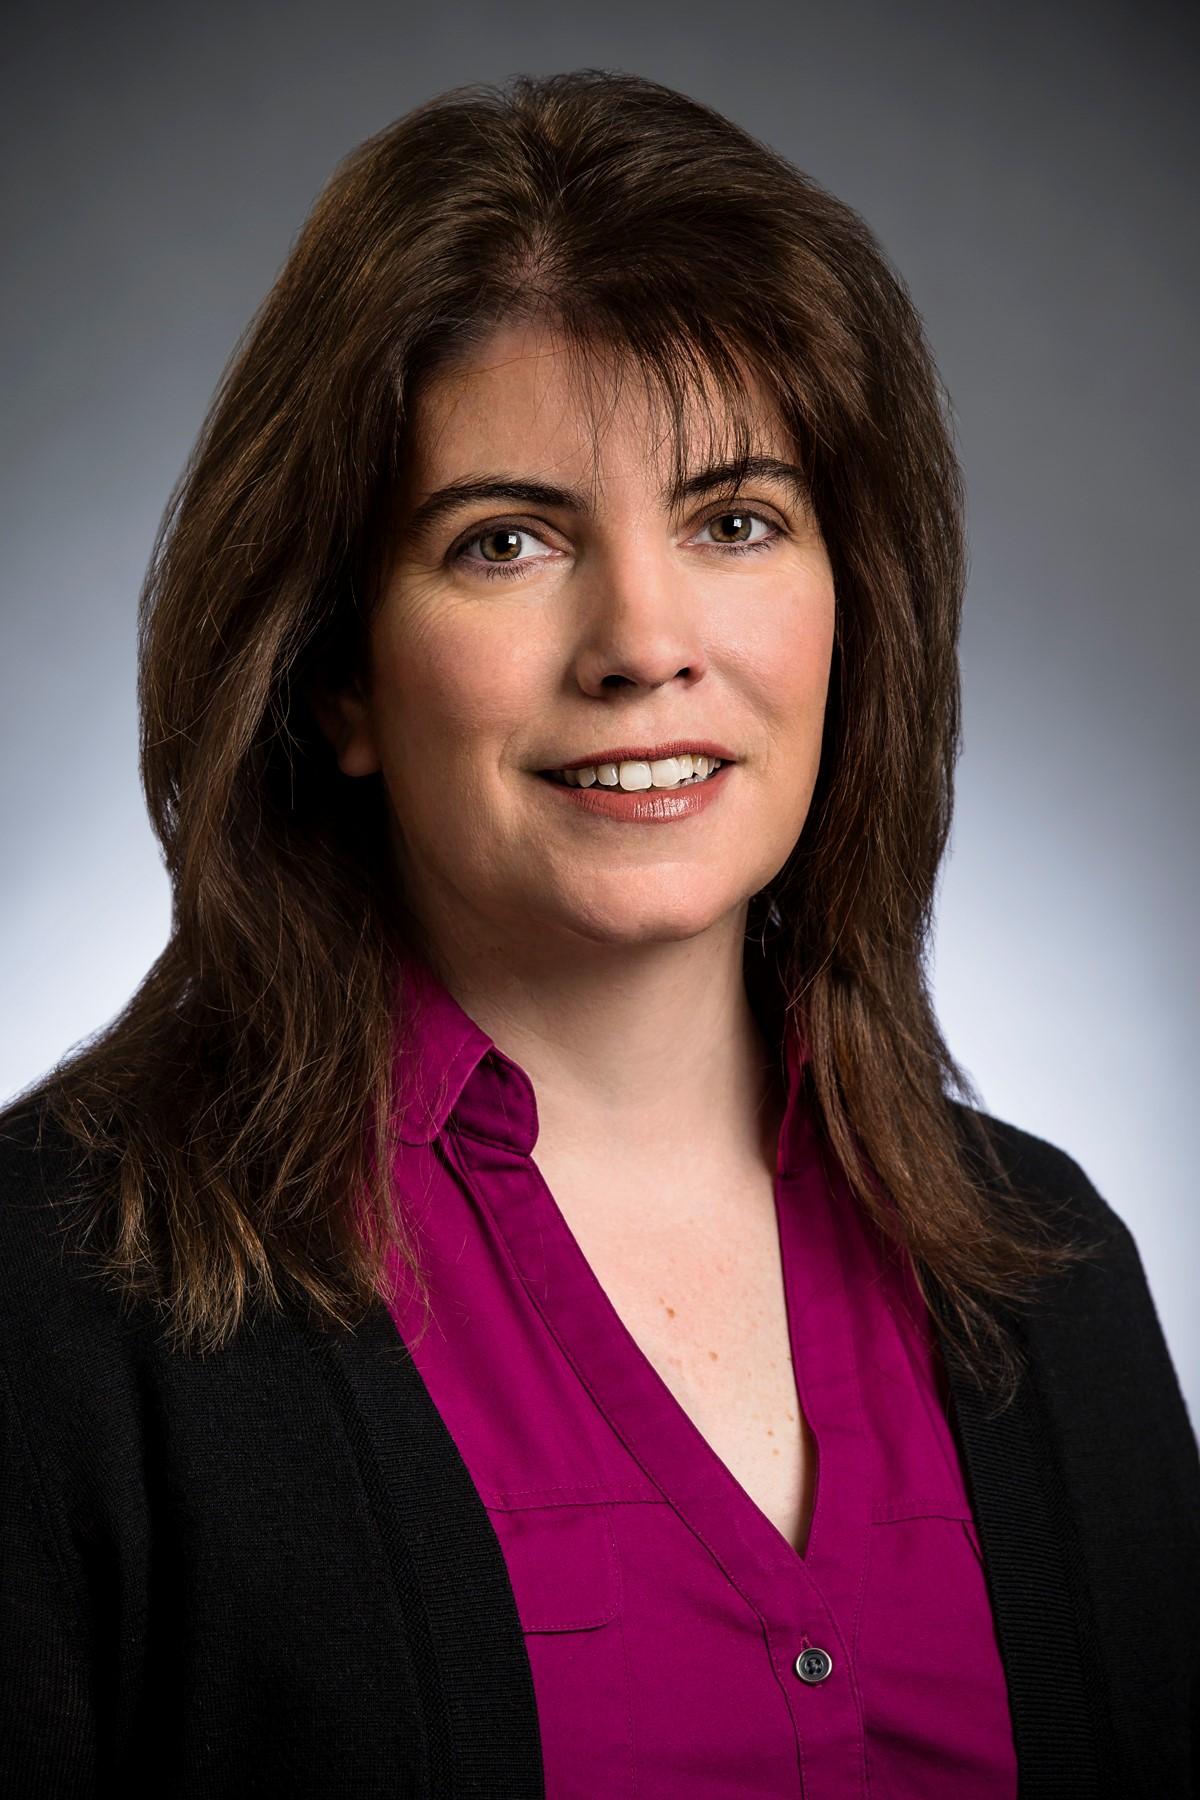 Kelly Donaldson